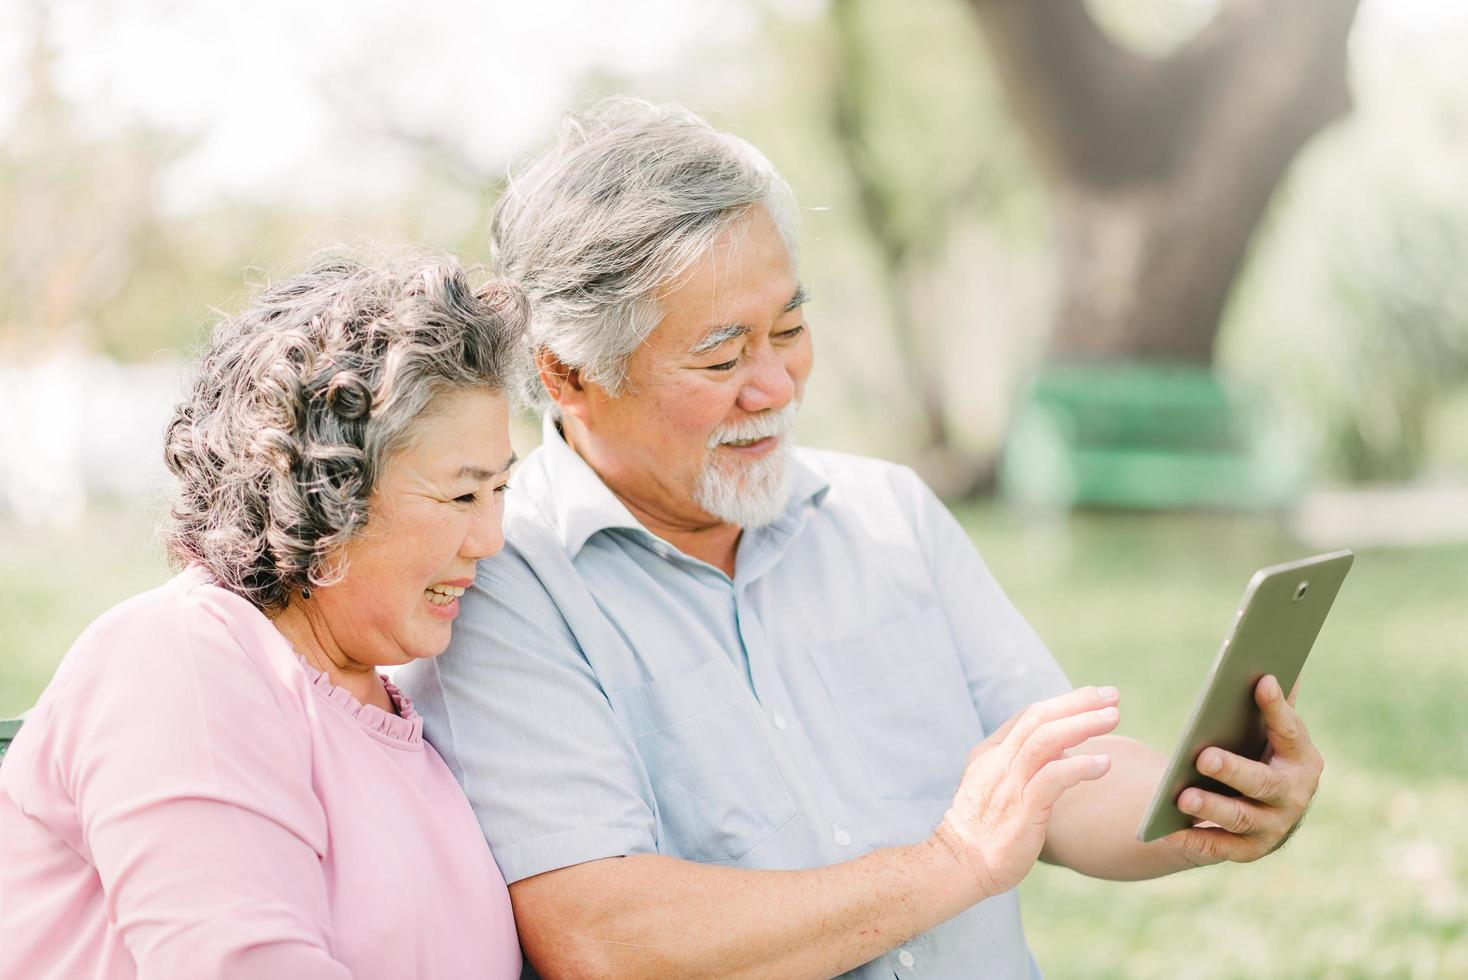 pareja senior con tableta al aire libre foto